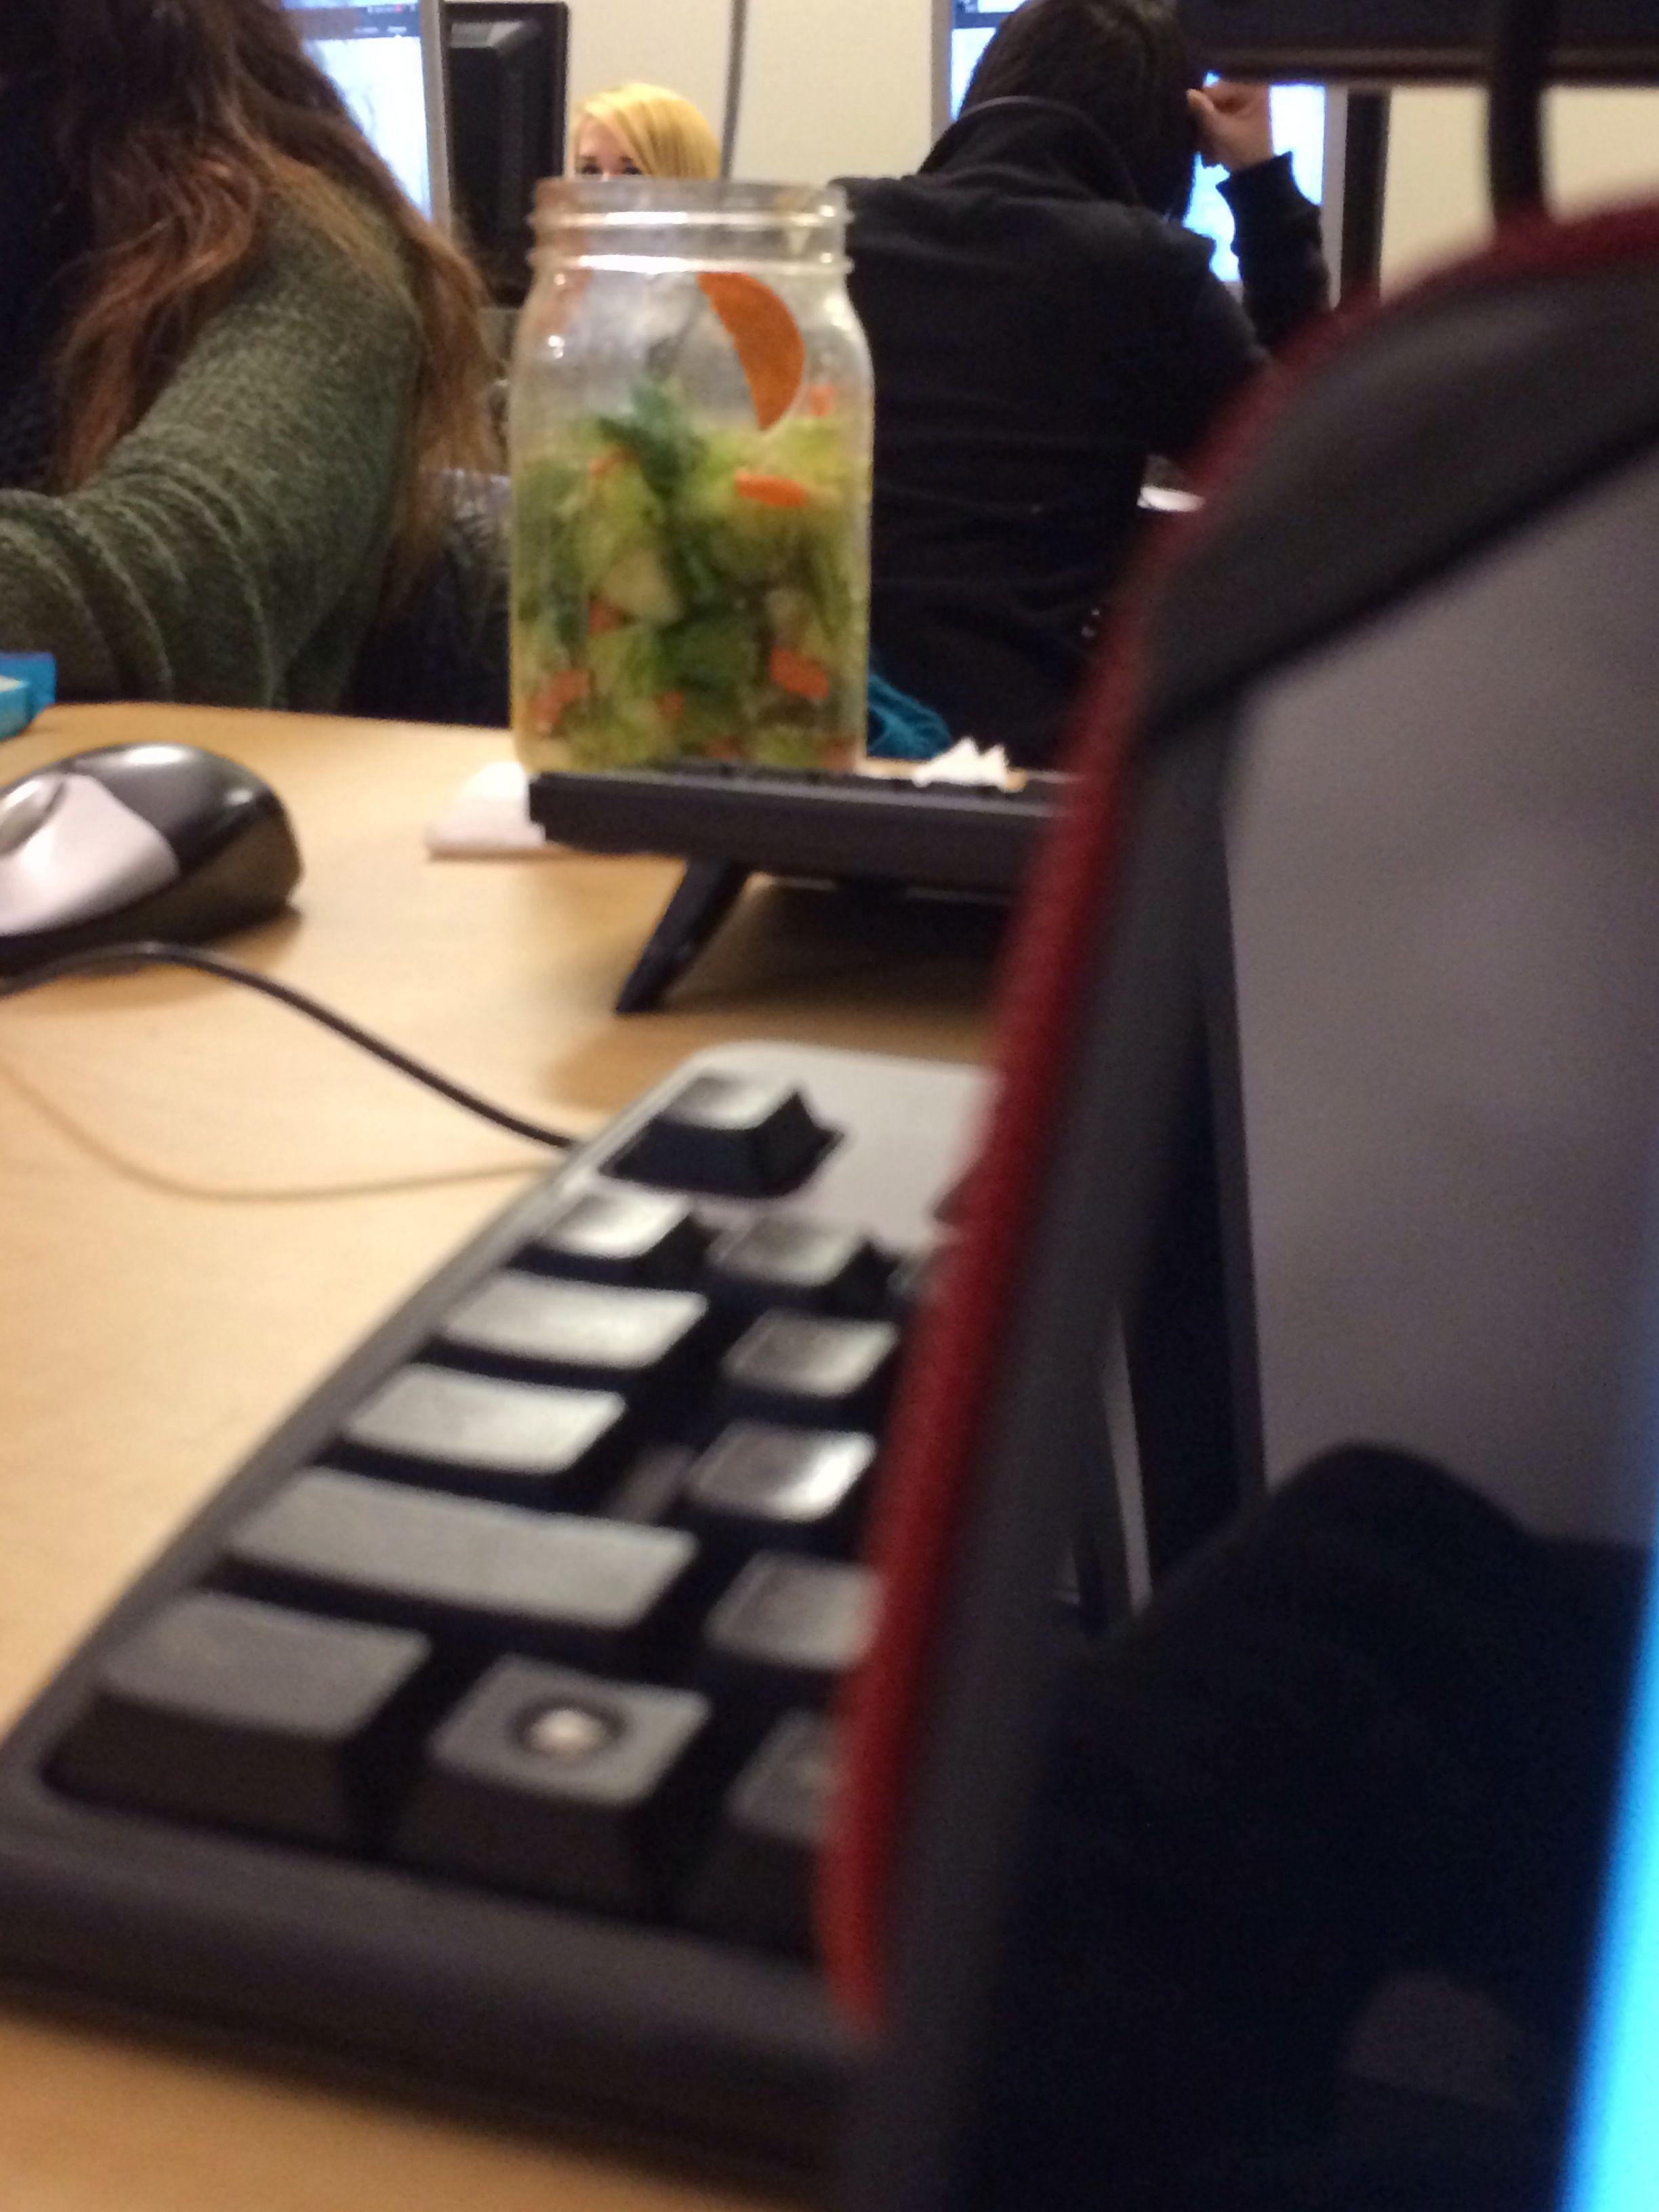 Salad in a jar for real! *excited snipe shot*